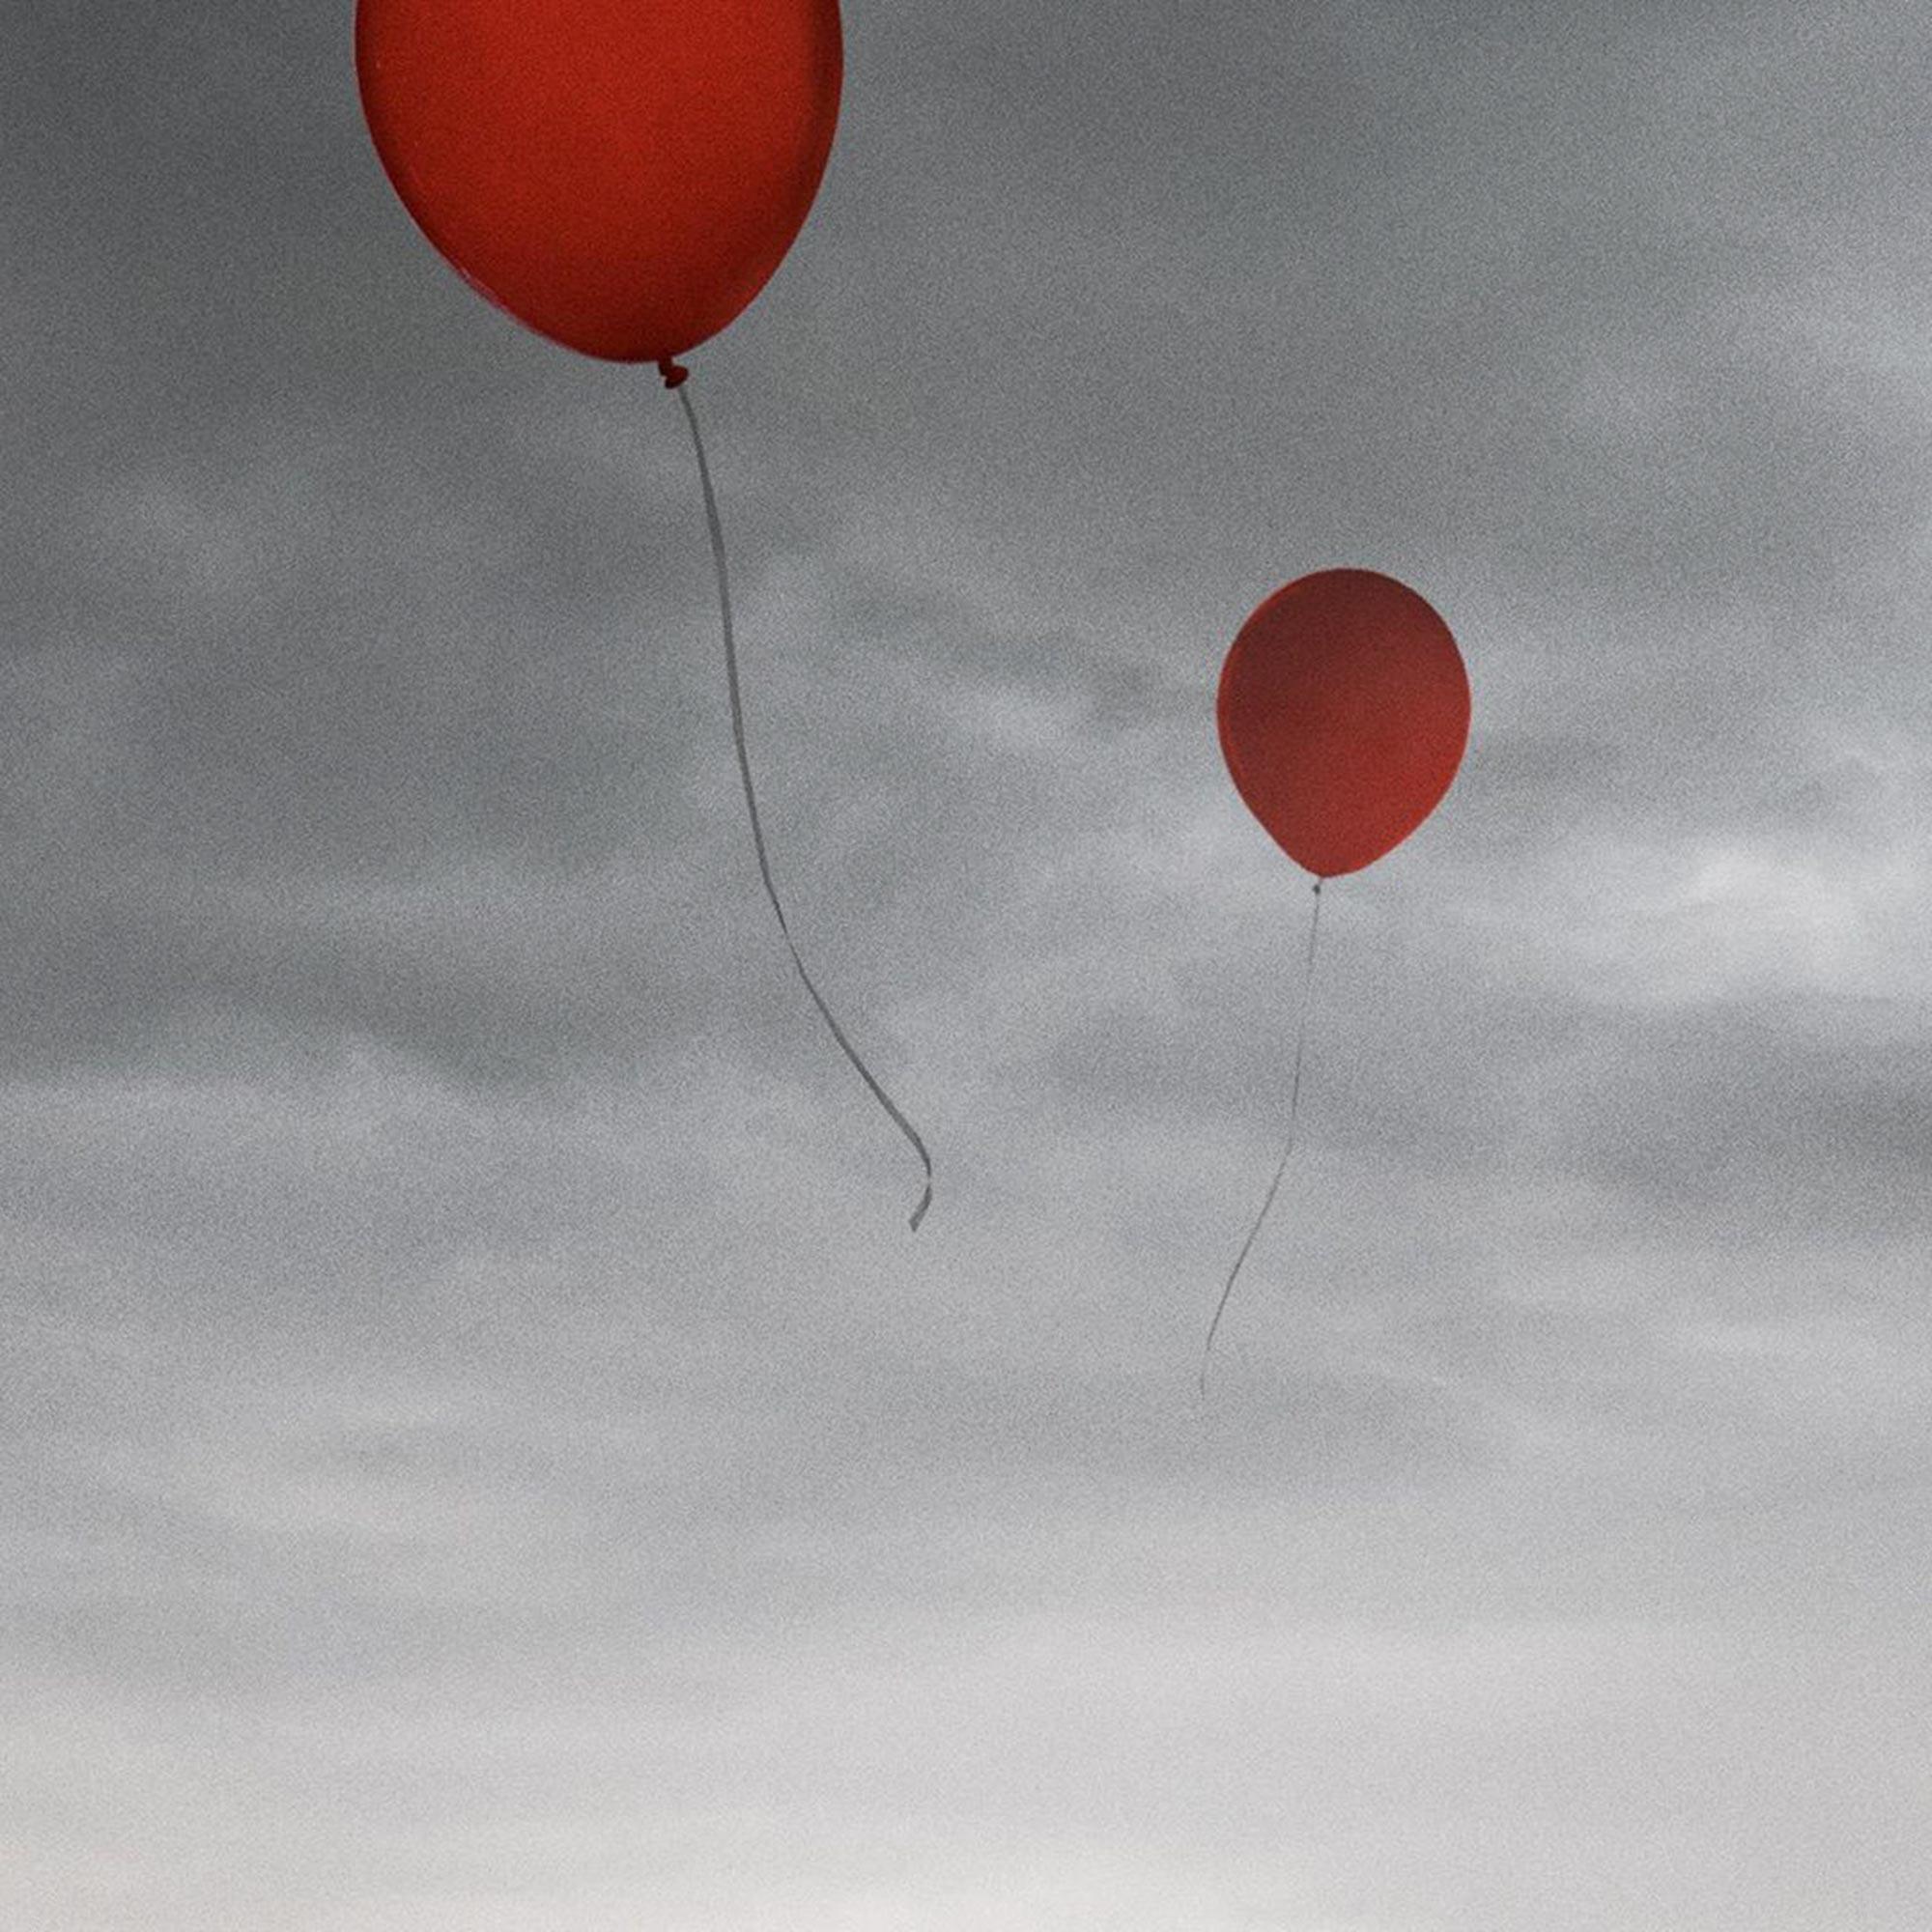 IT Chapter 2 cast red balloon Instagram ImageCR: /Instagram